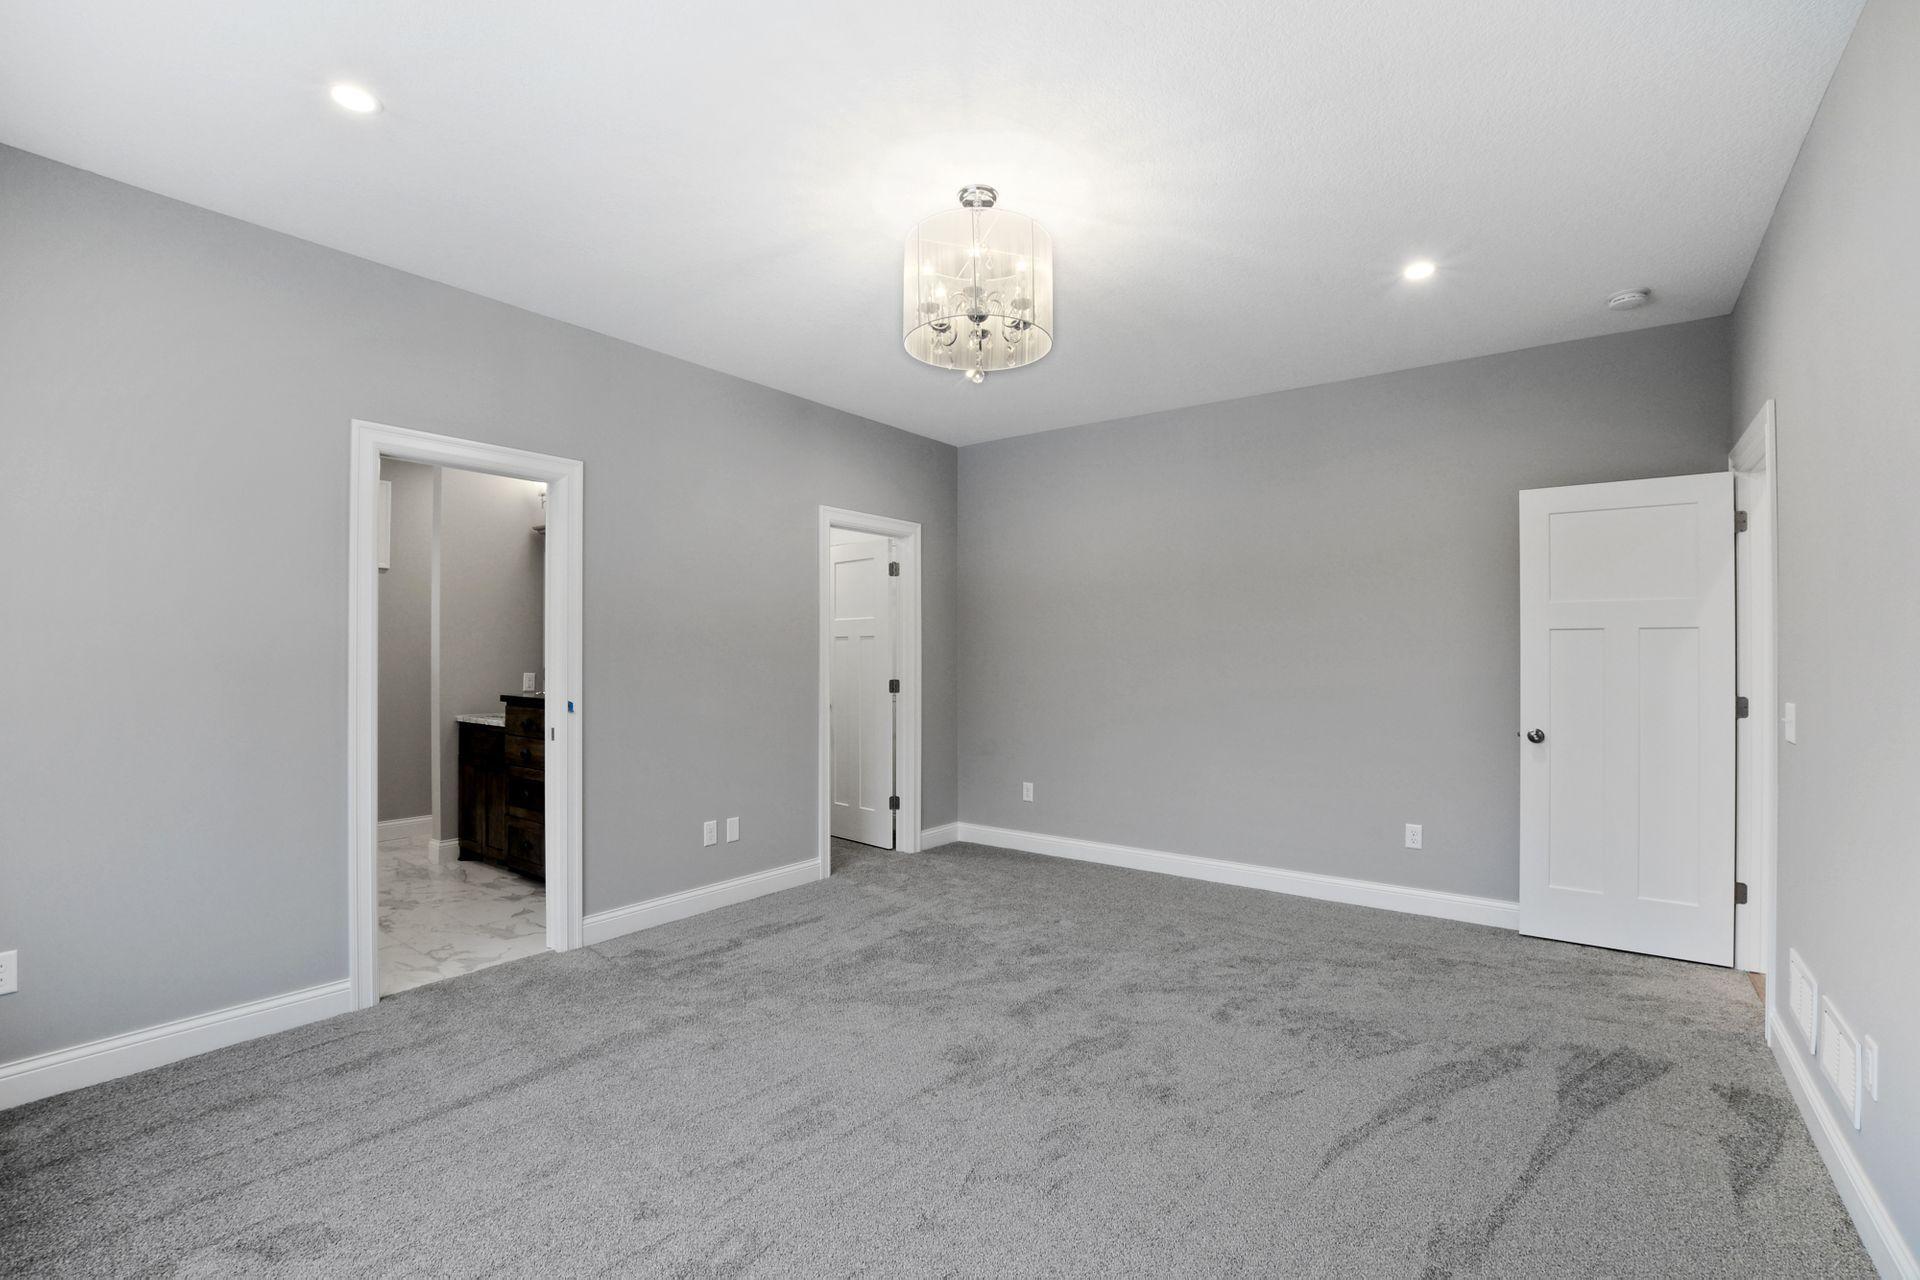 Garage Idea Grey Carpet Bedroom Grey Walls And Carpet Light